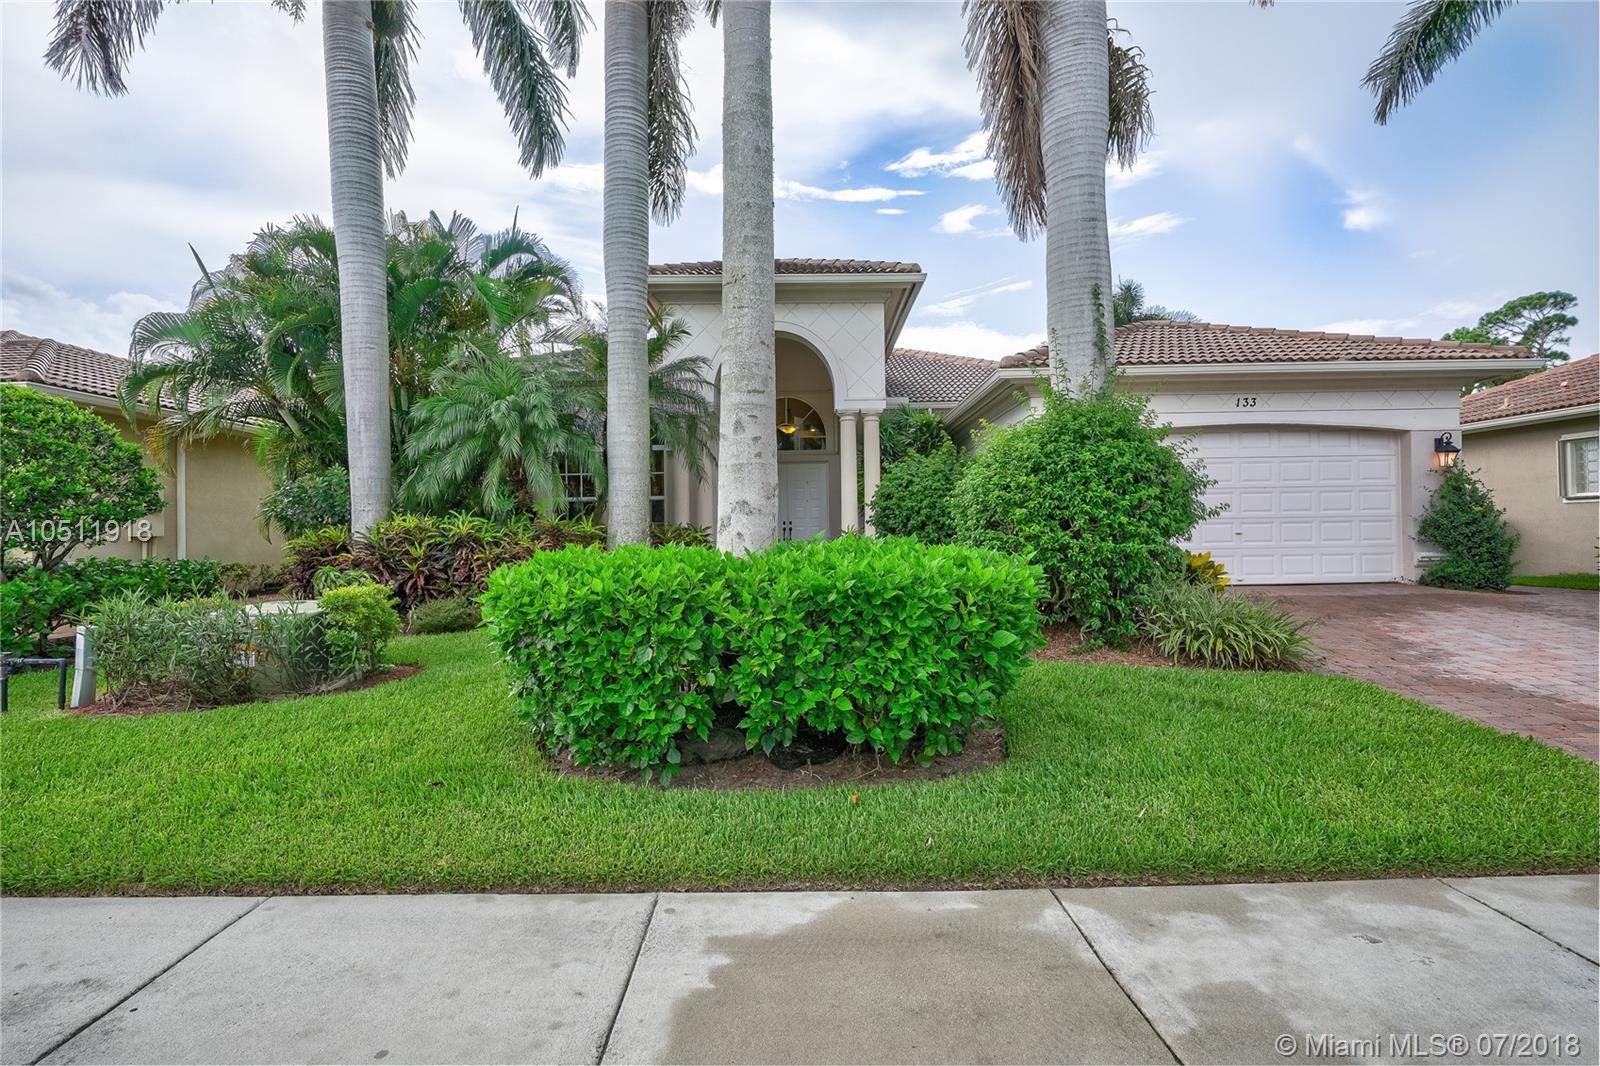 133 Abondance Dr, Palm Beach Gardens, FL 33410